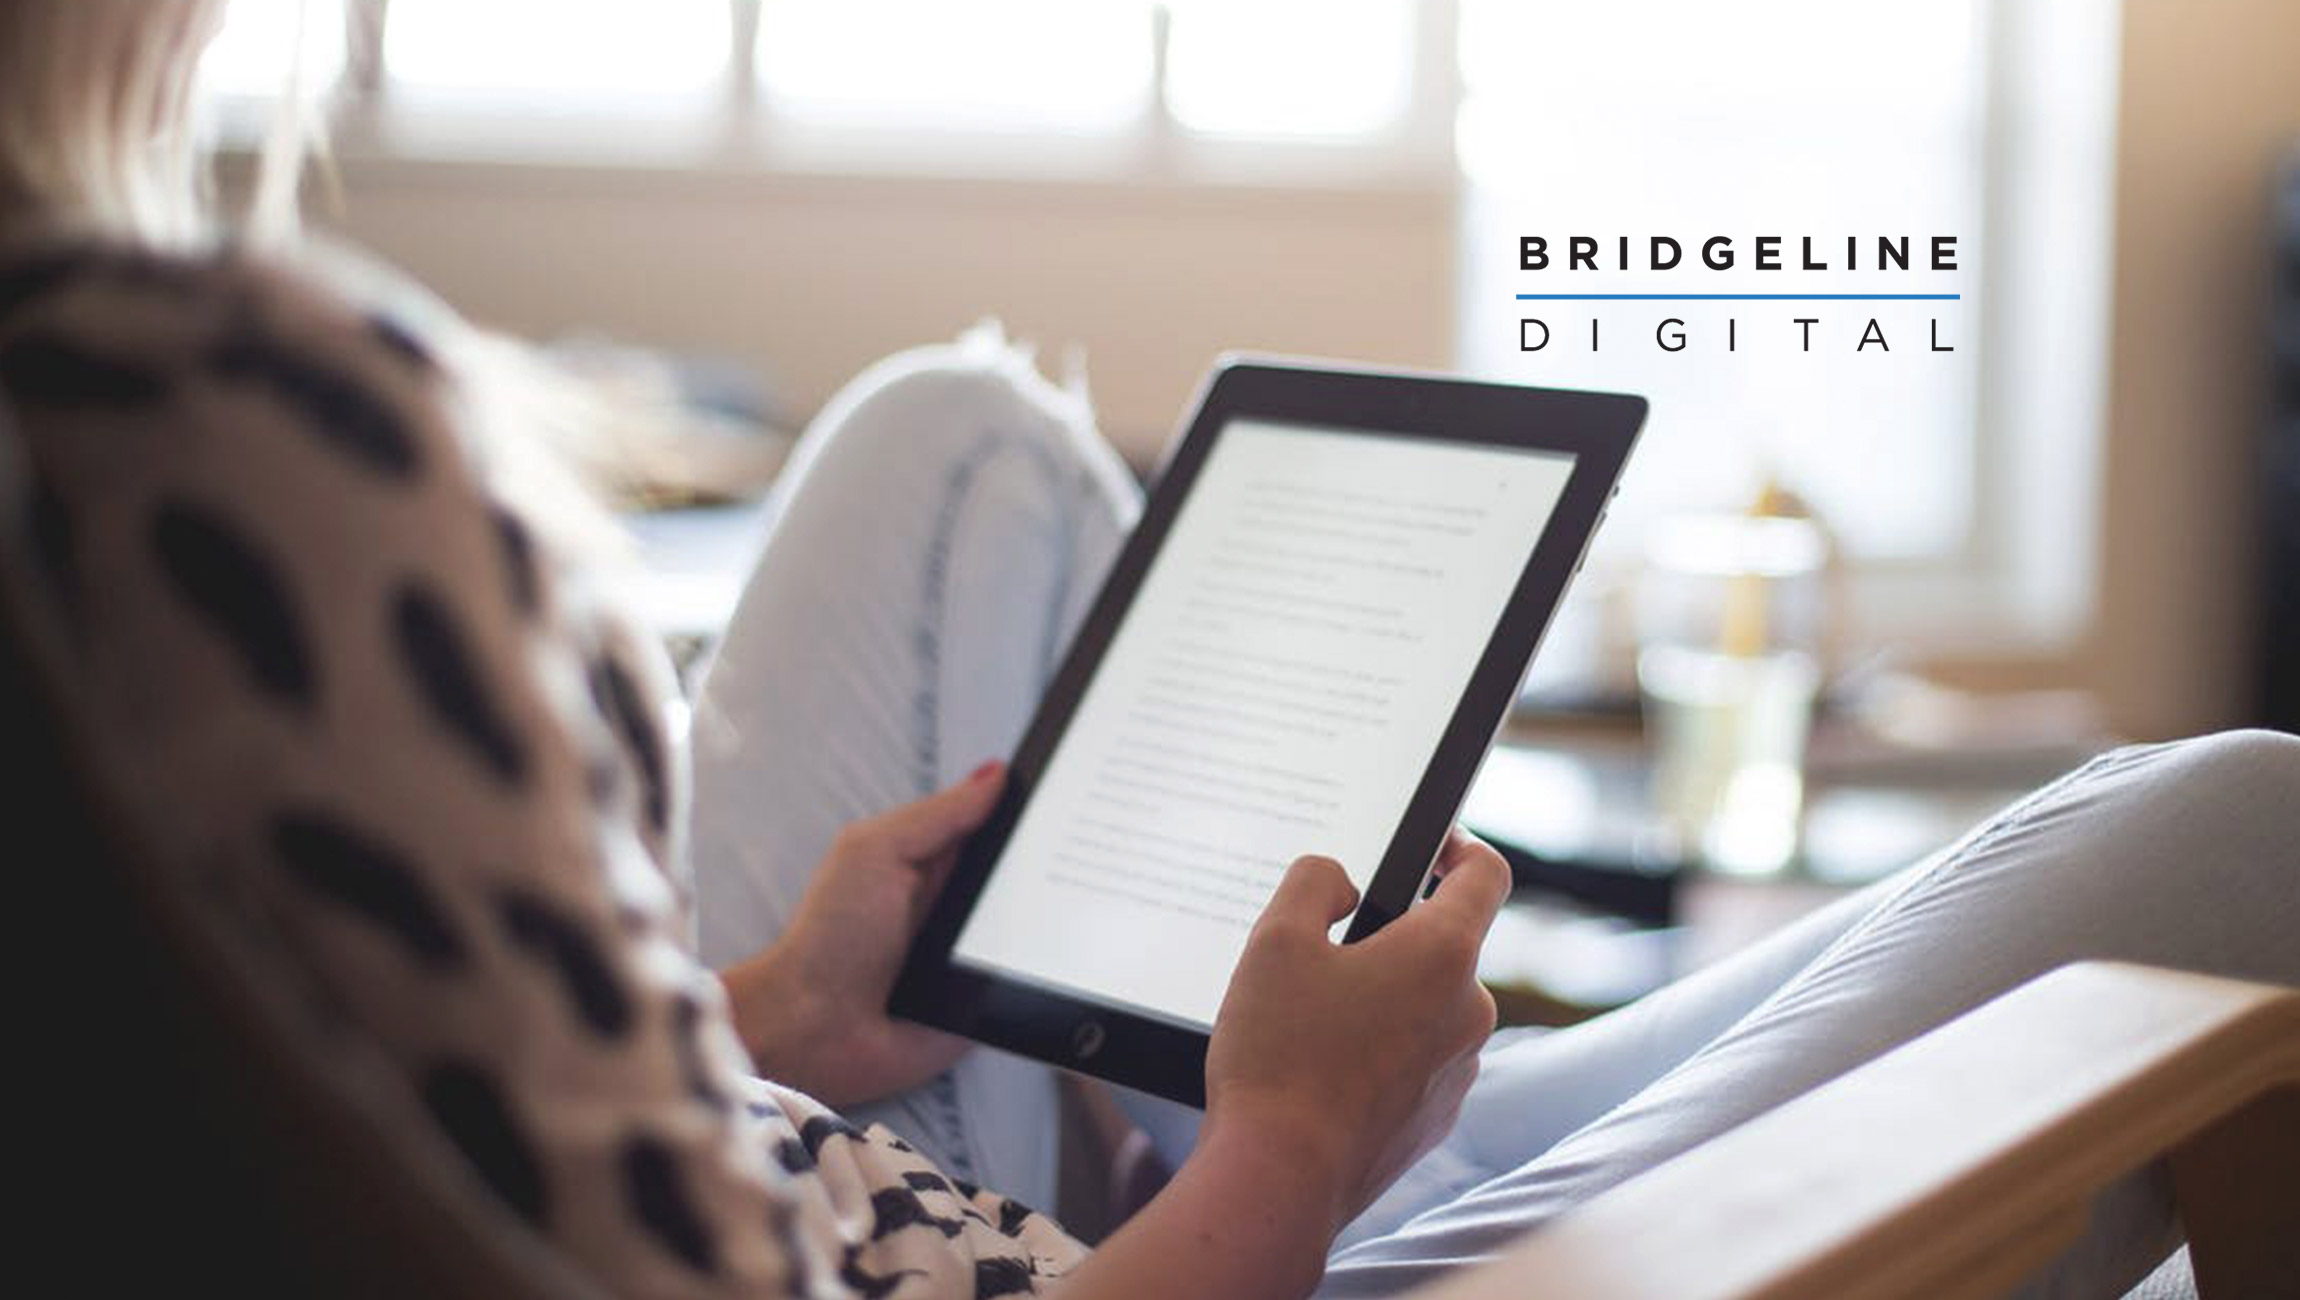 Bridgeline